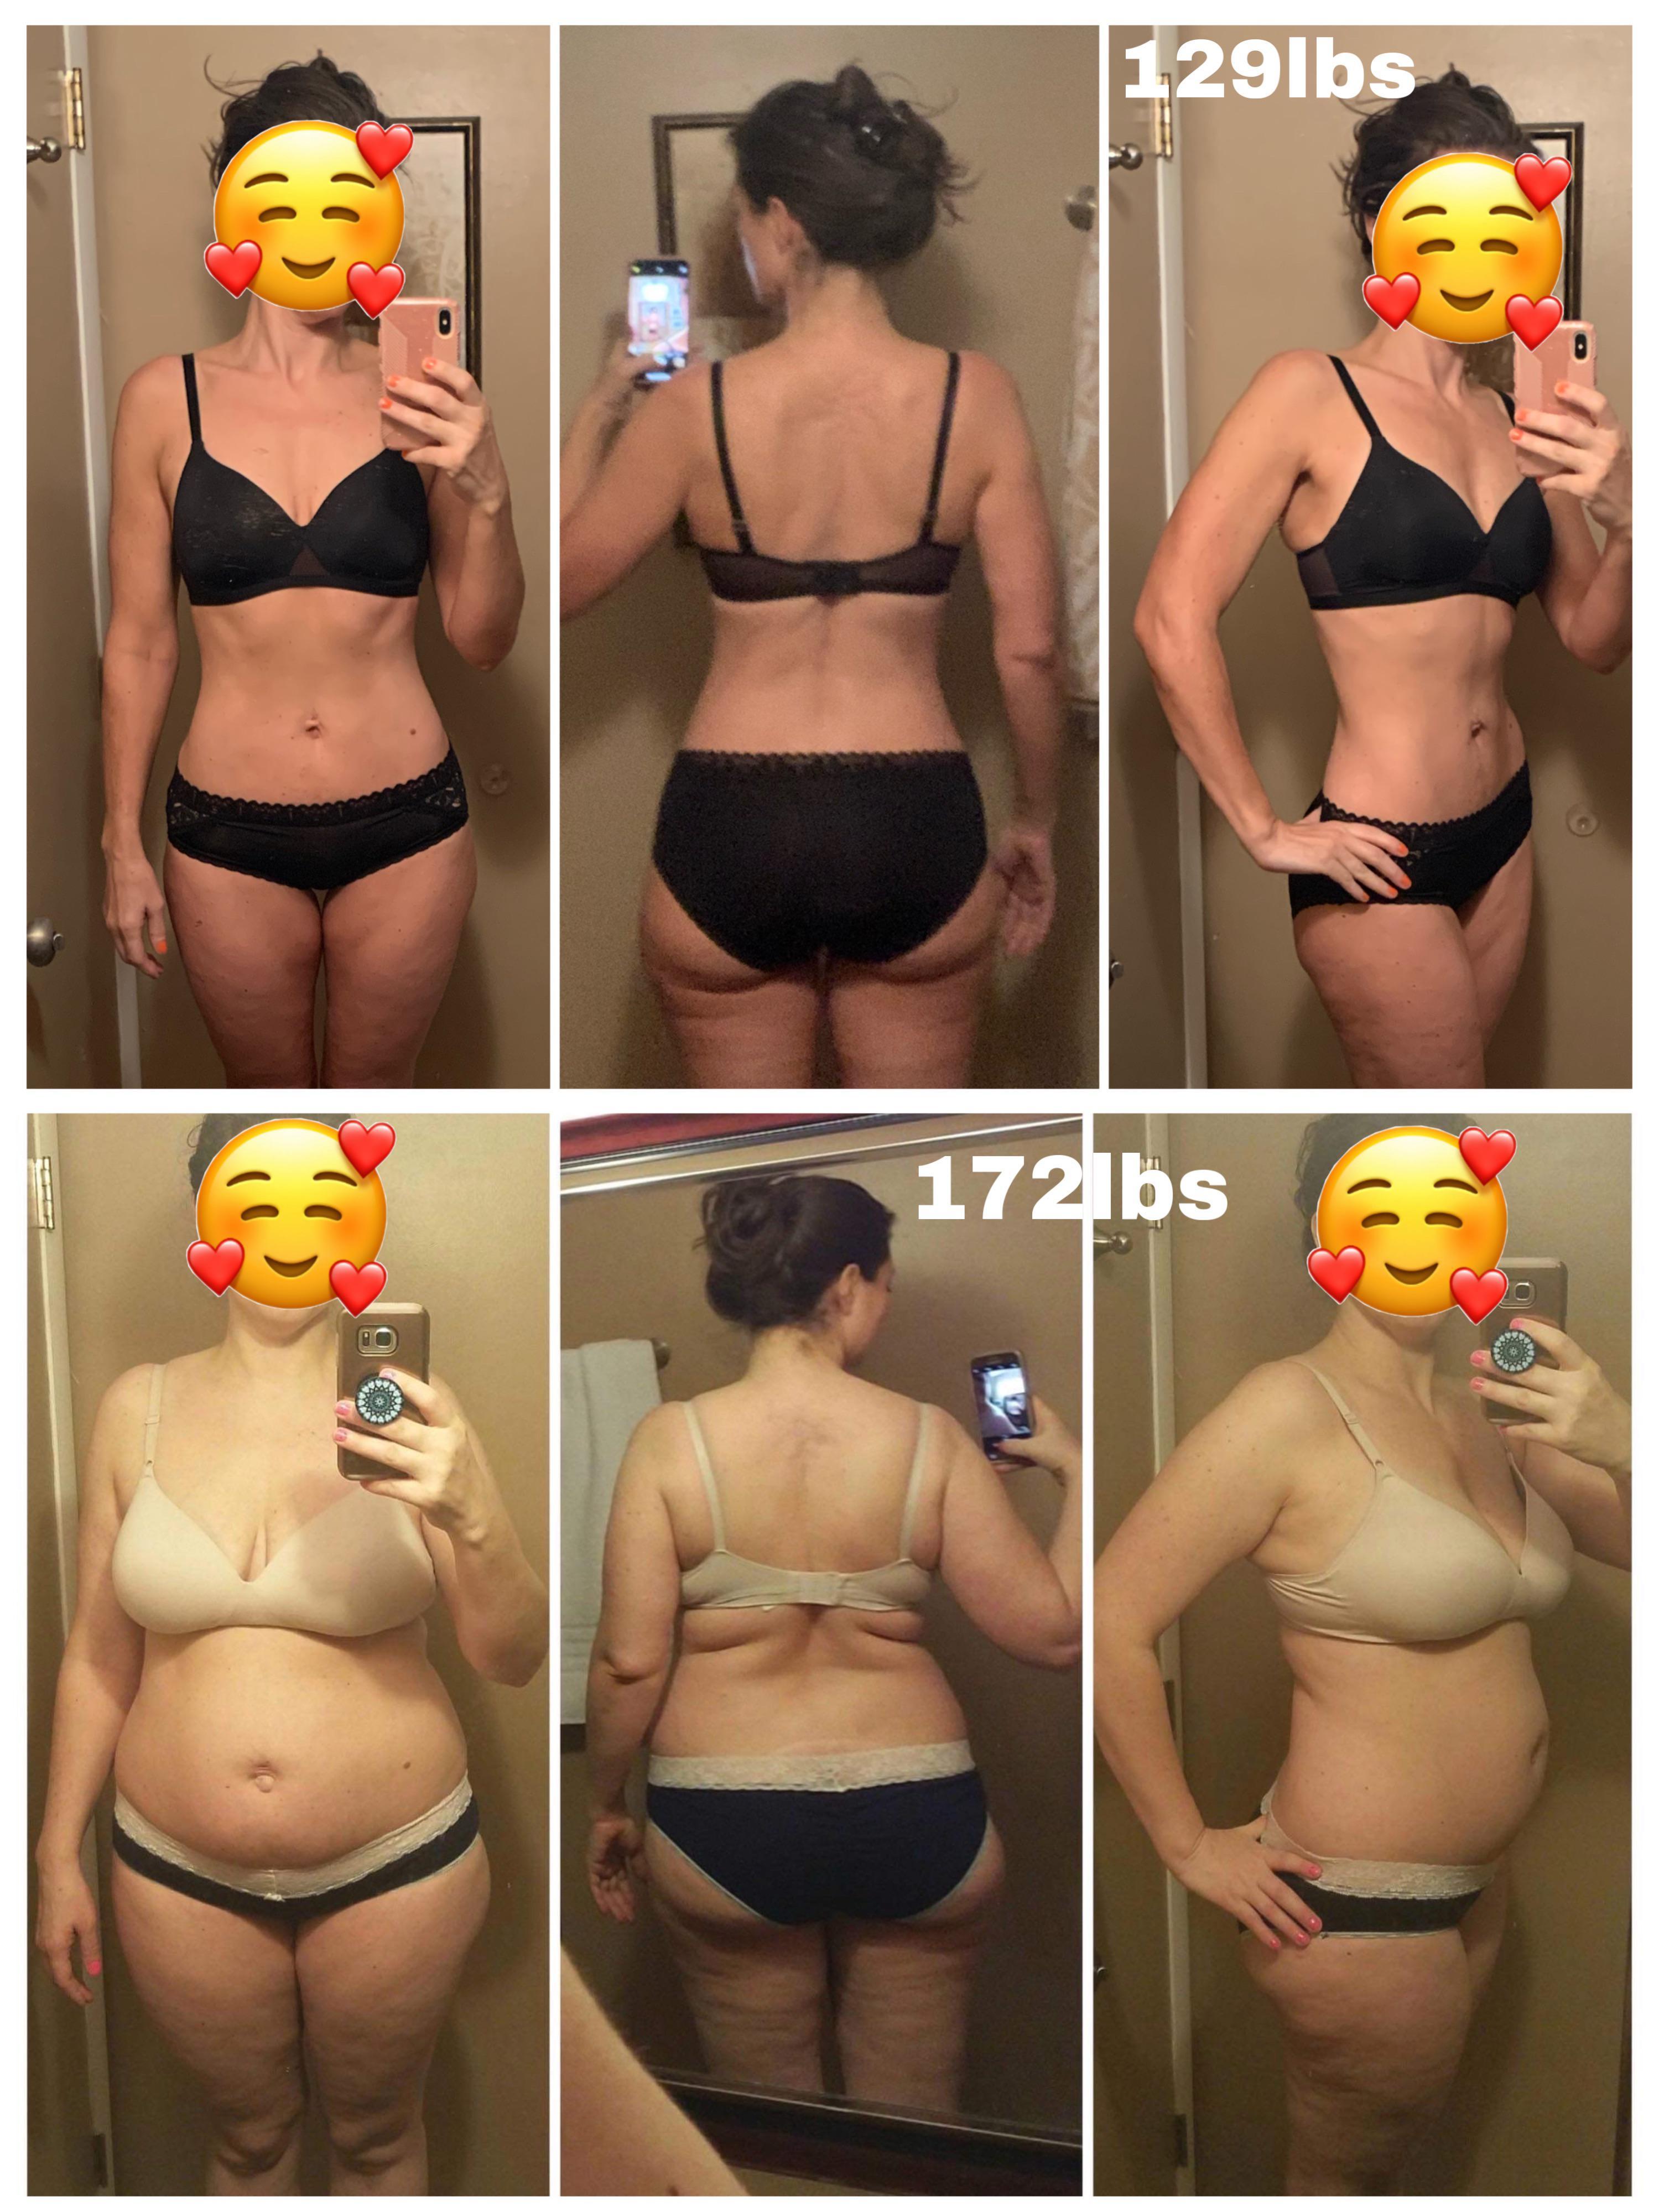 5 feet 6 Female Progress Pics of 43 lbs Weight Loss 172 lbs to 129 lbs